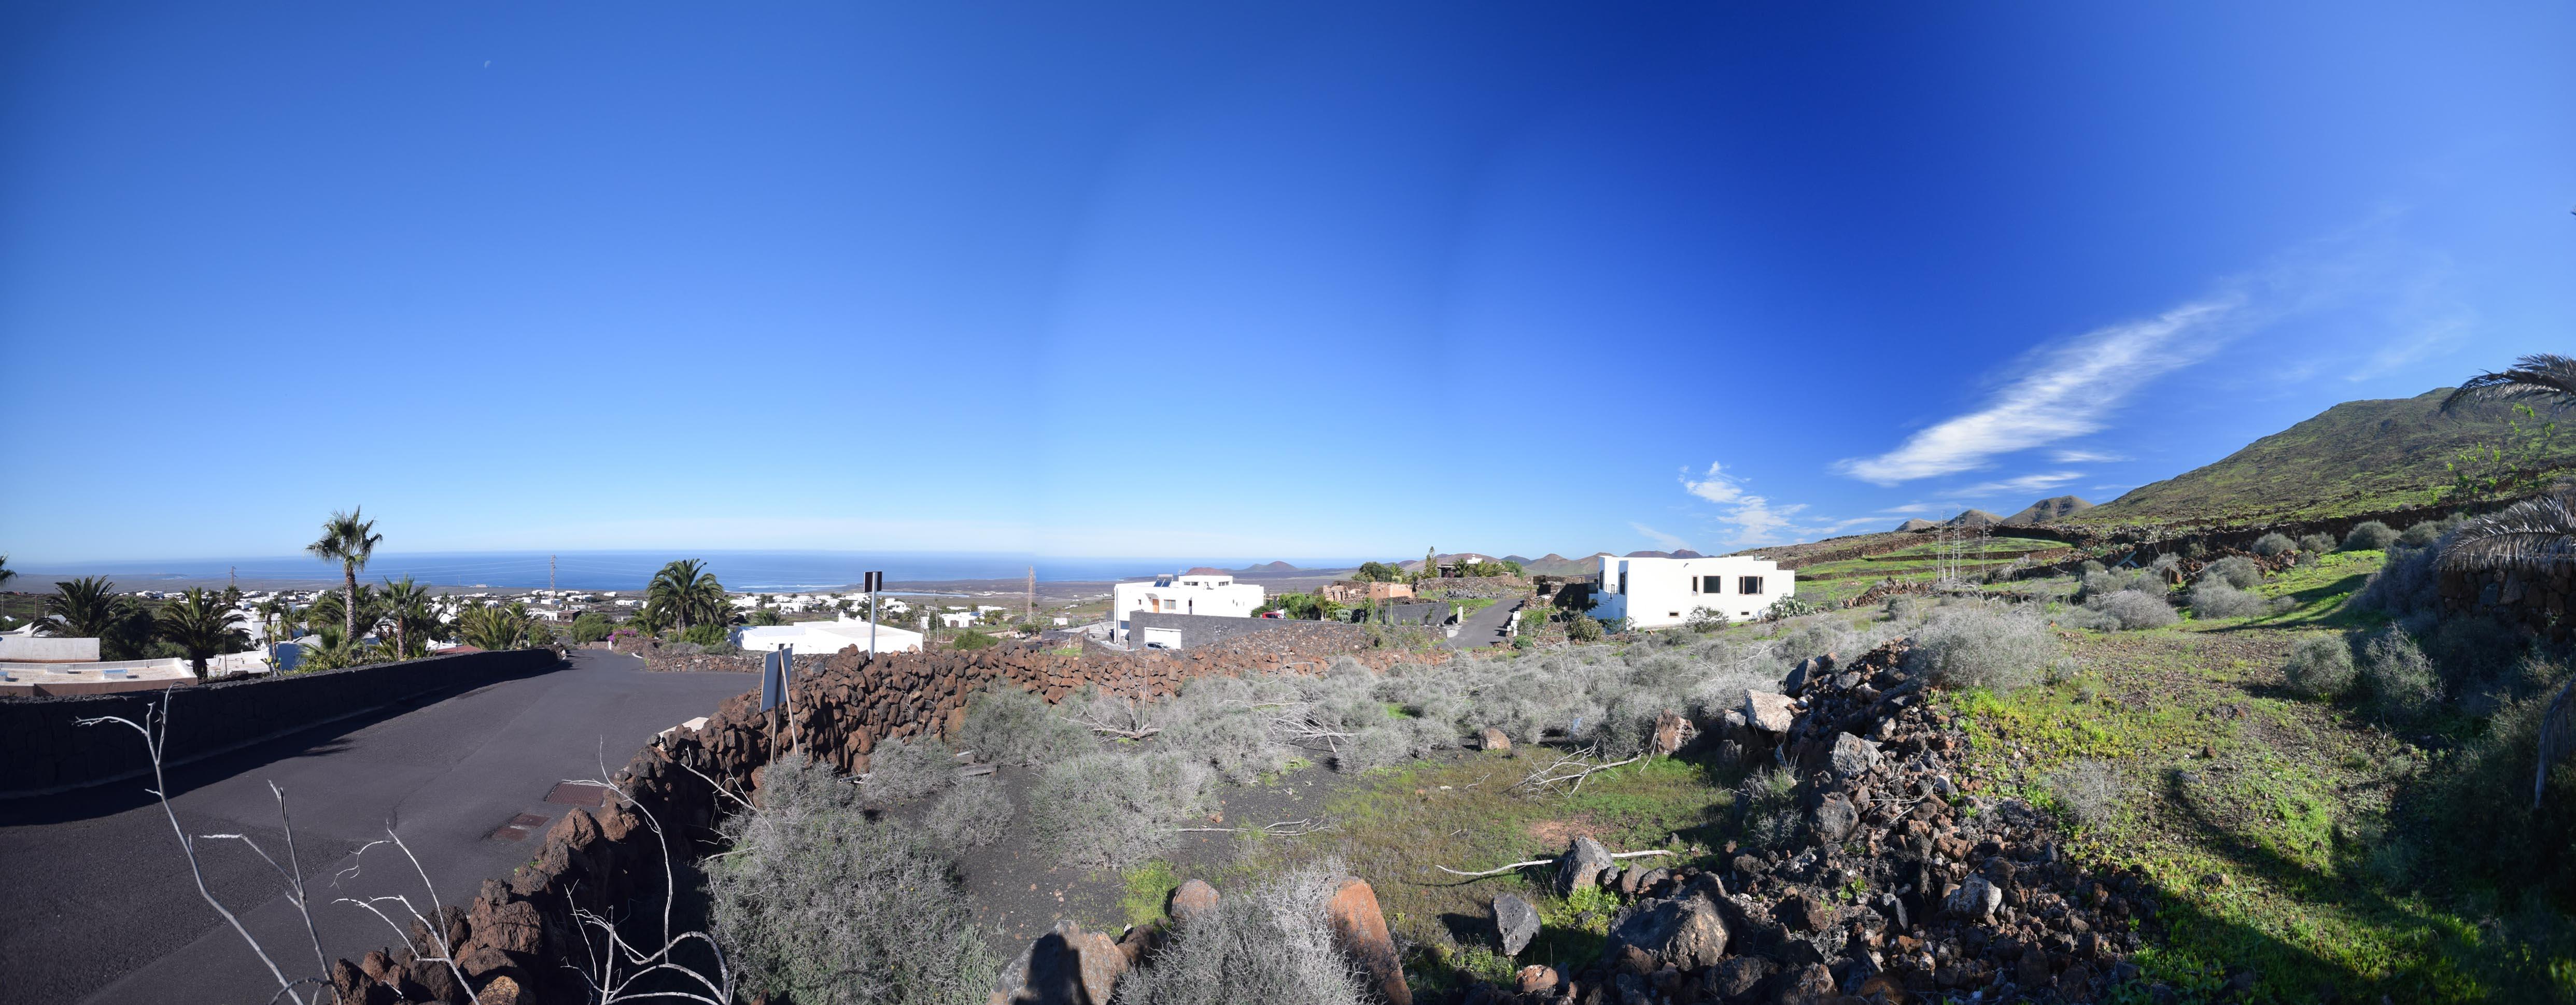 2018 12 LasBrenas December Panorama 002